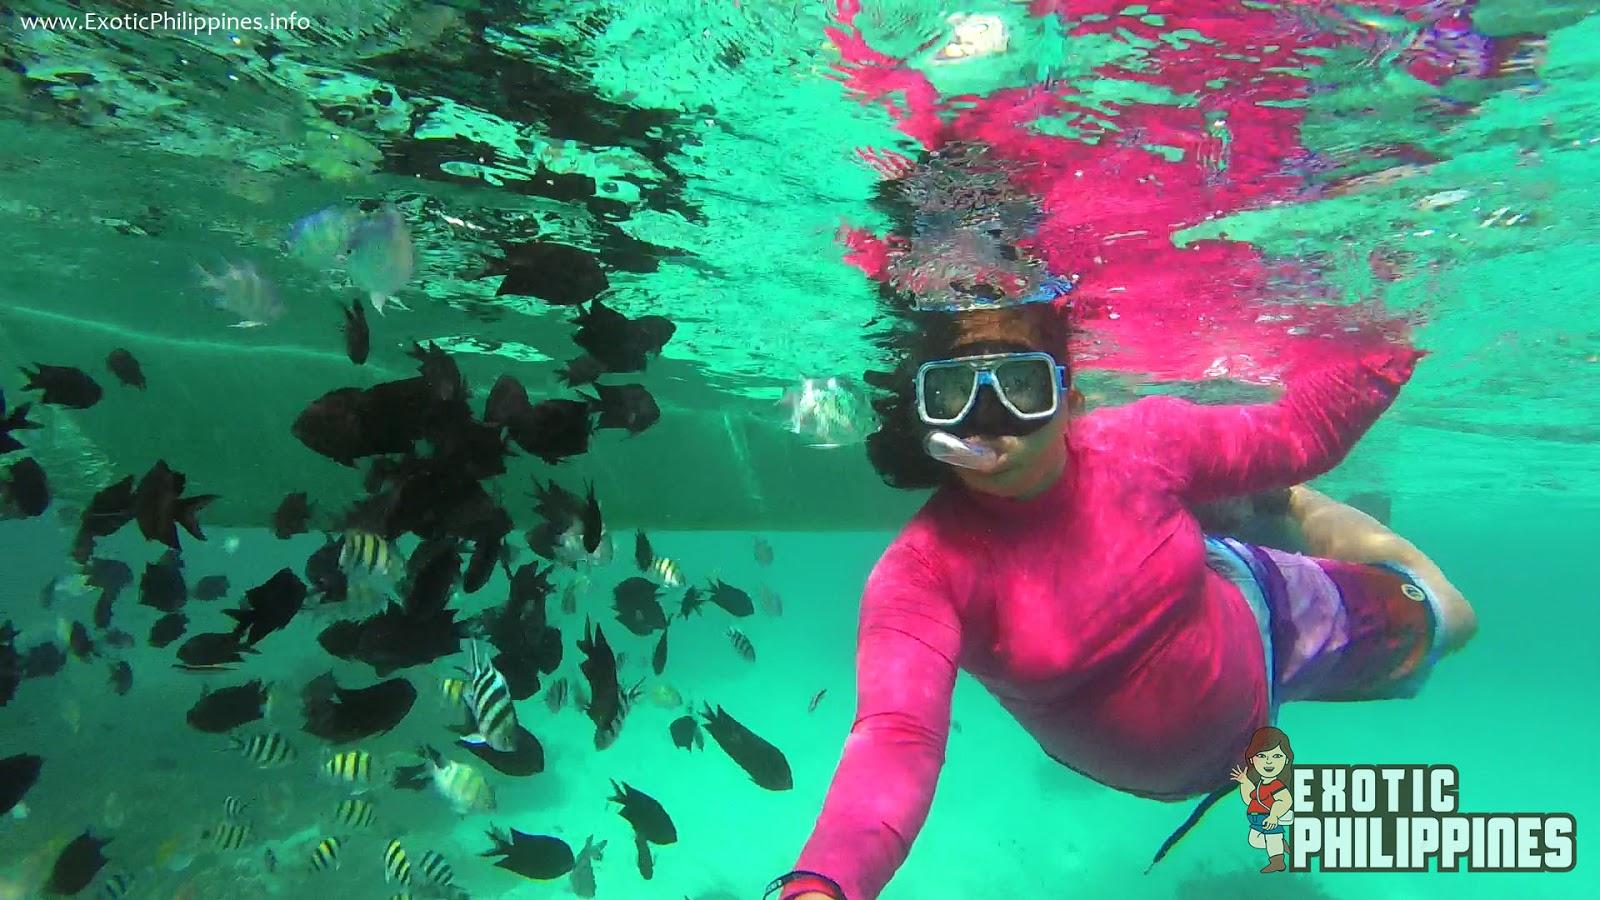 Fish Trip at Malcapuya Island Coron Palawan Exotic Philippines Travel Blog Blogger